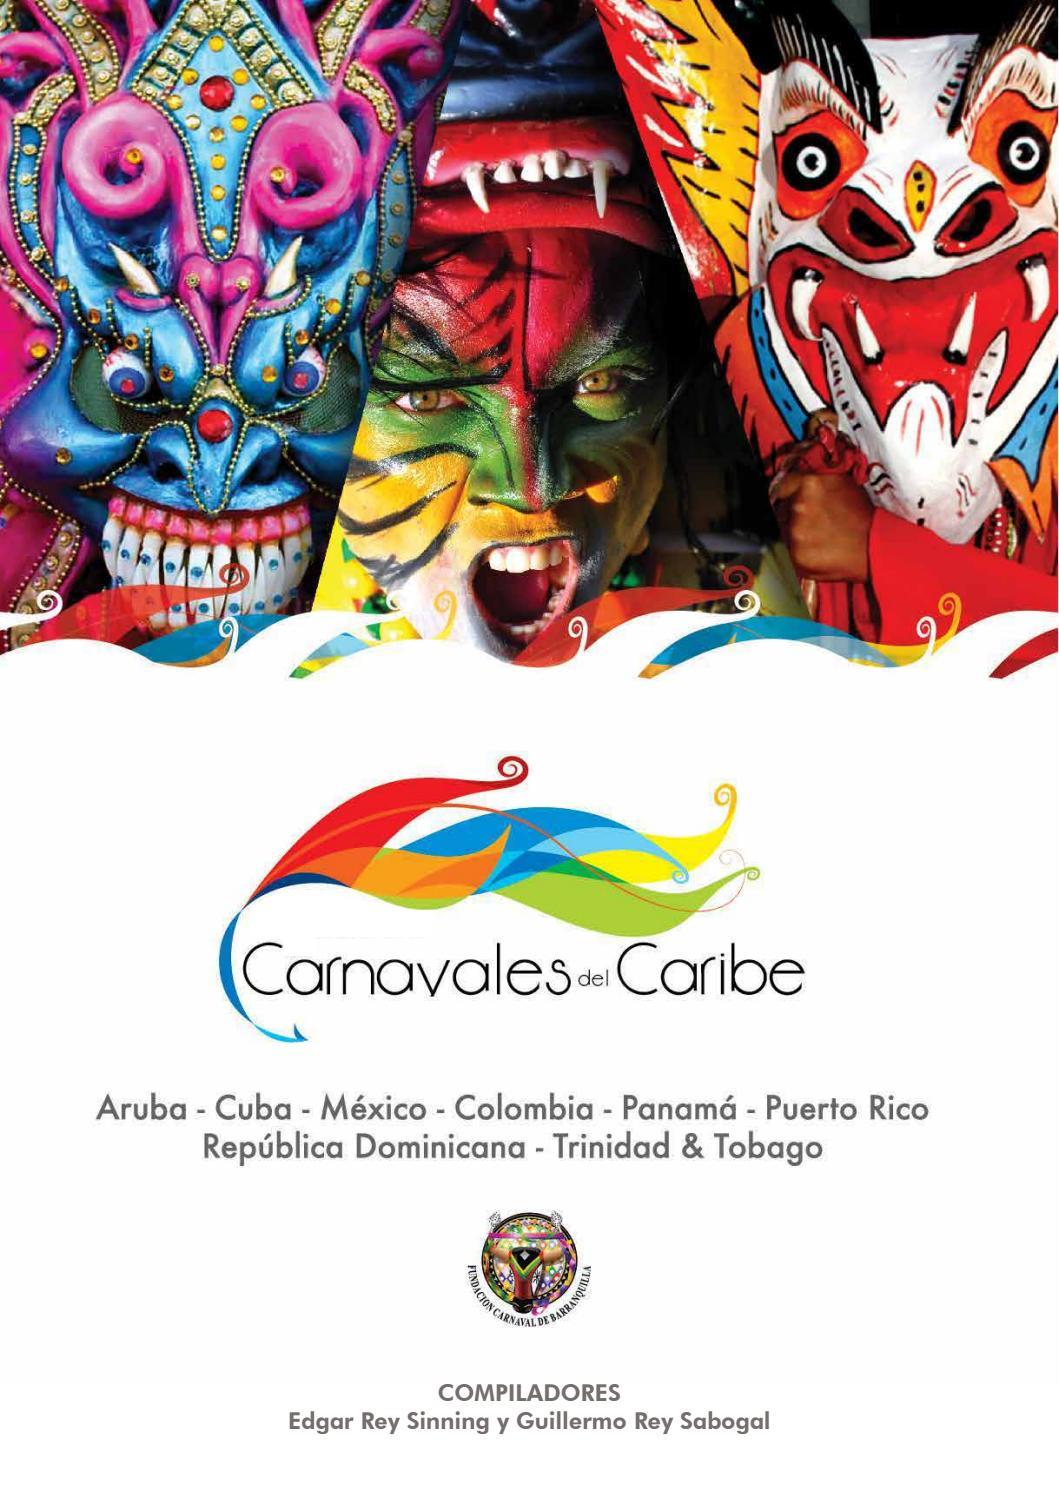 Carnavales del Caribe by Carnaval de Barranquilla - issuu